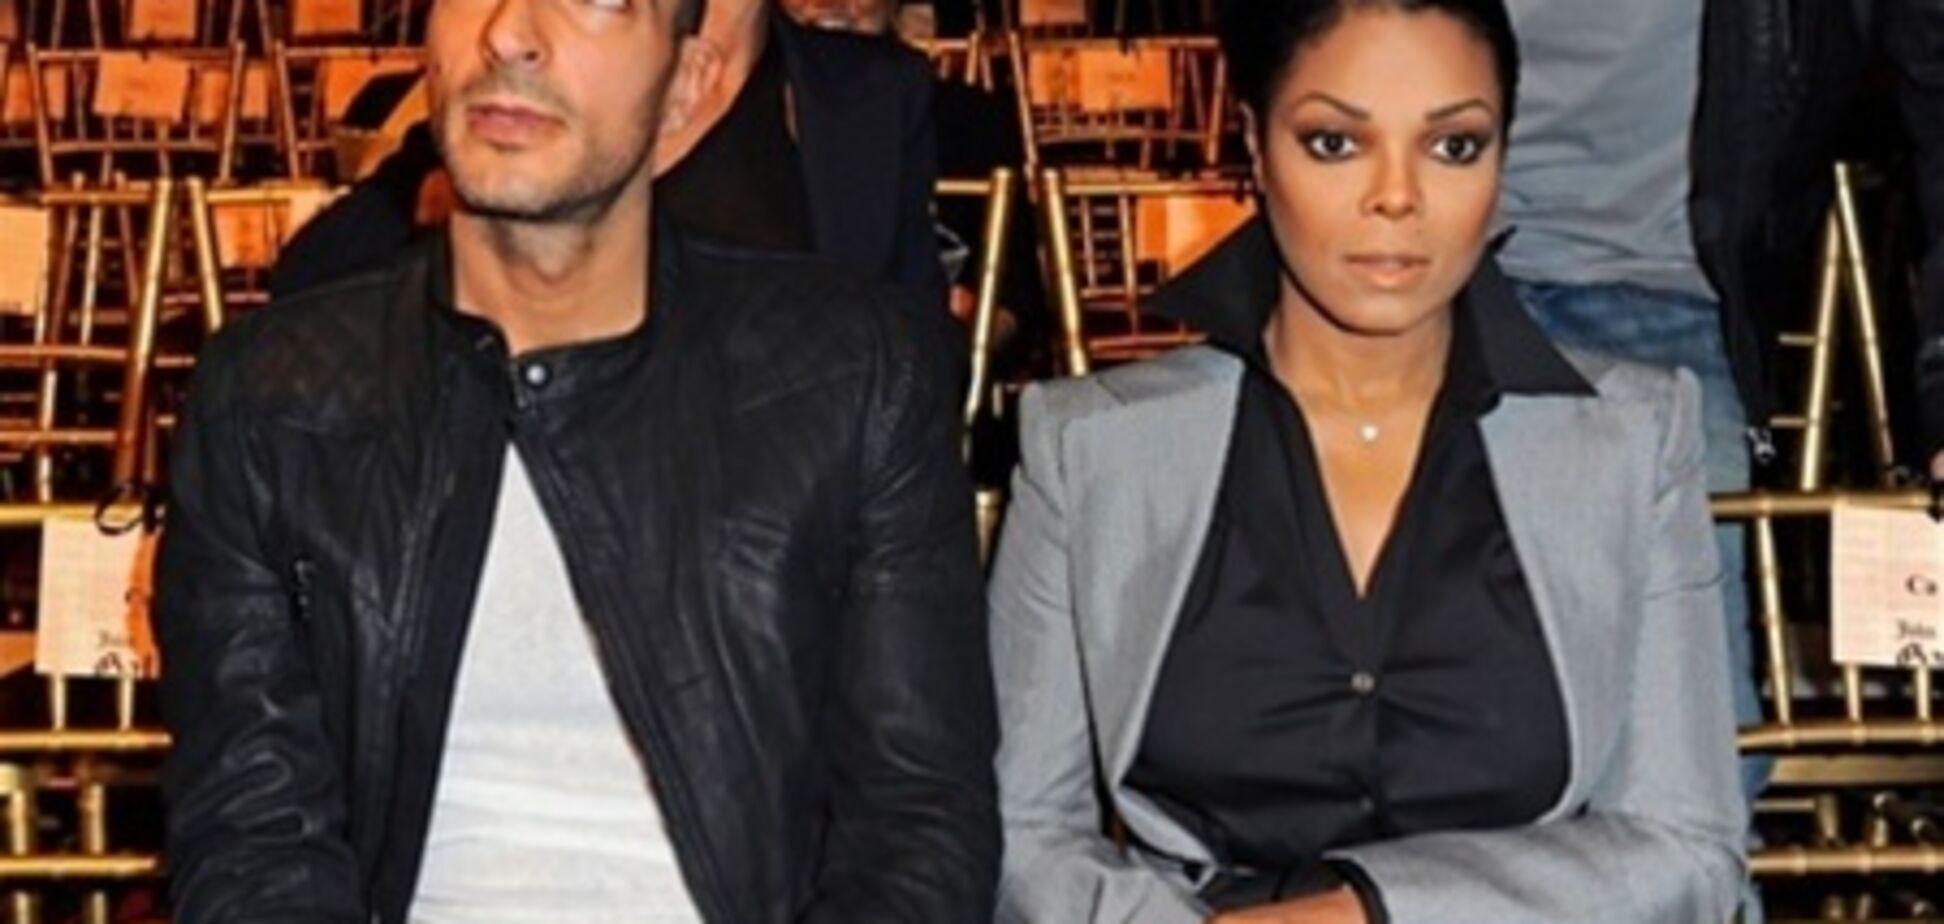 Сестра Джексона тайно вышла замуж за миллиардера